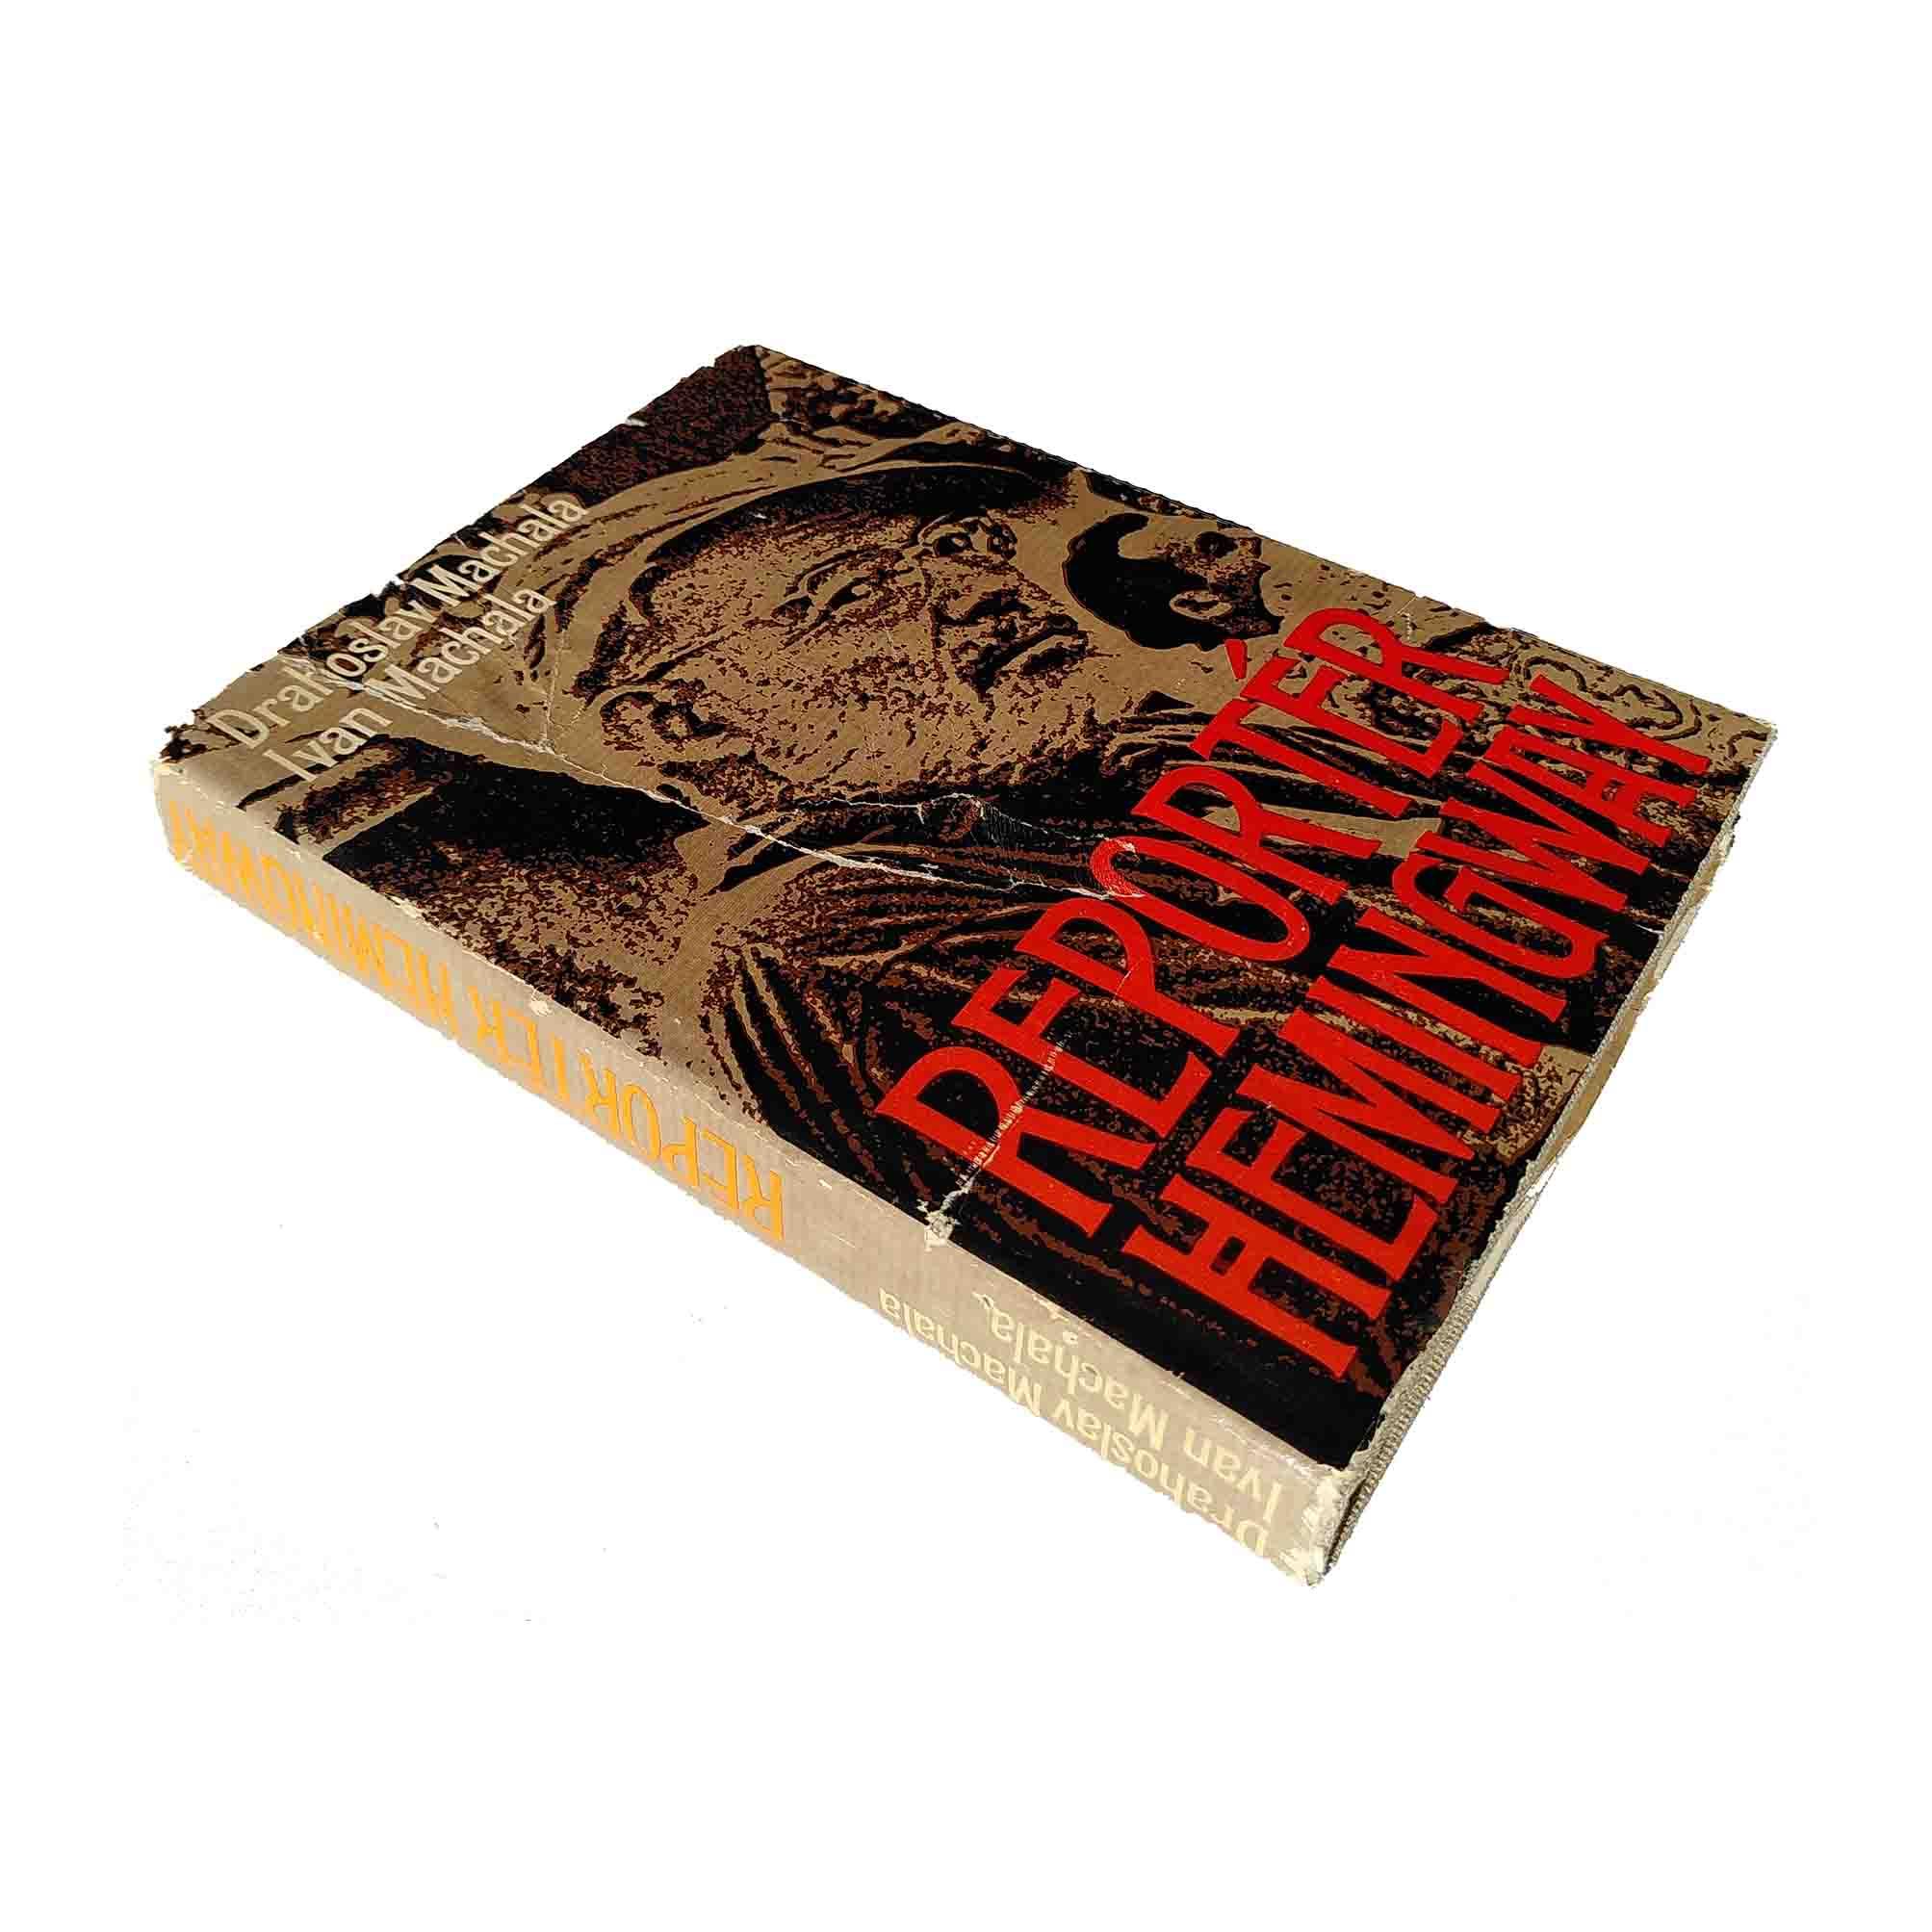 5912 Hemingway Machala Biography Slovak 1980 Dust Jacket free N